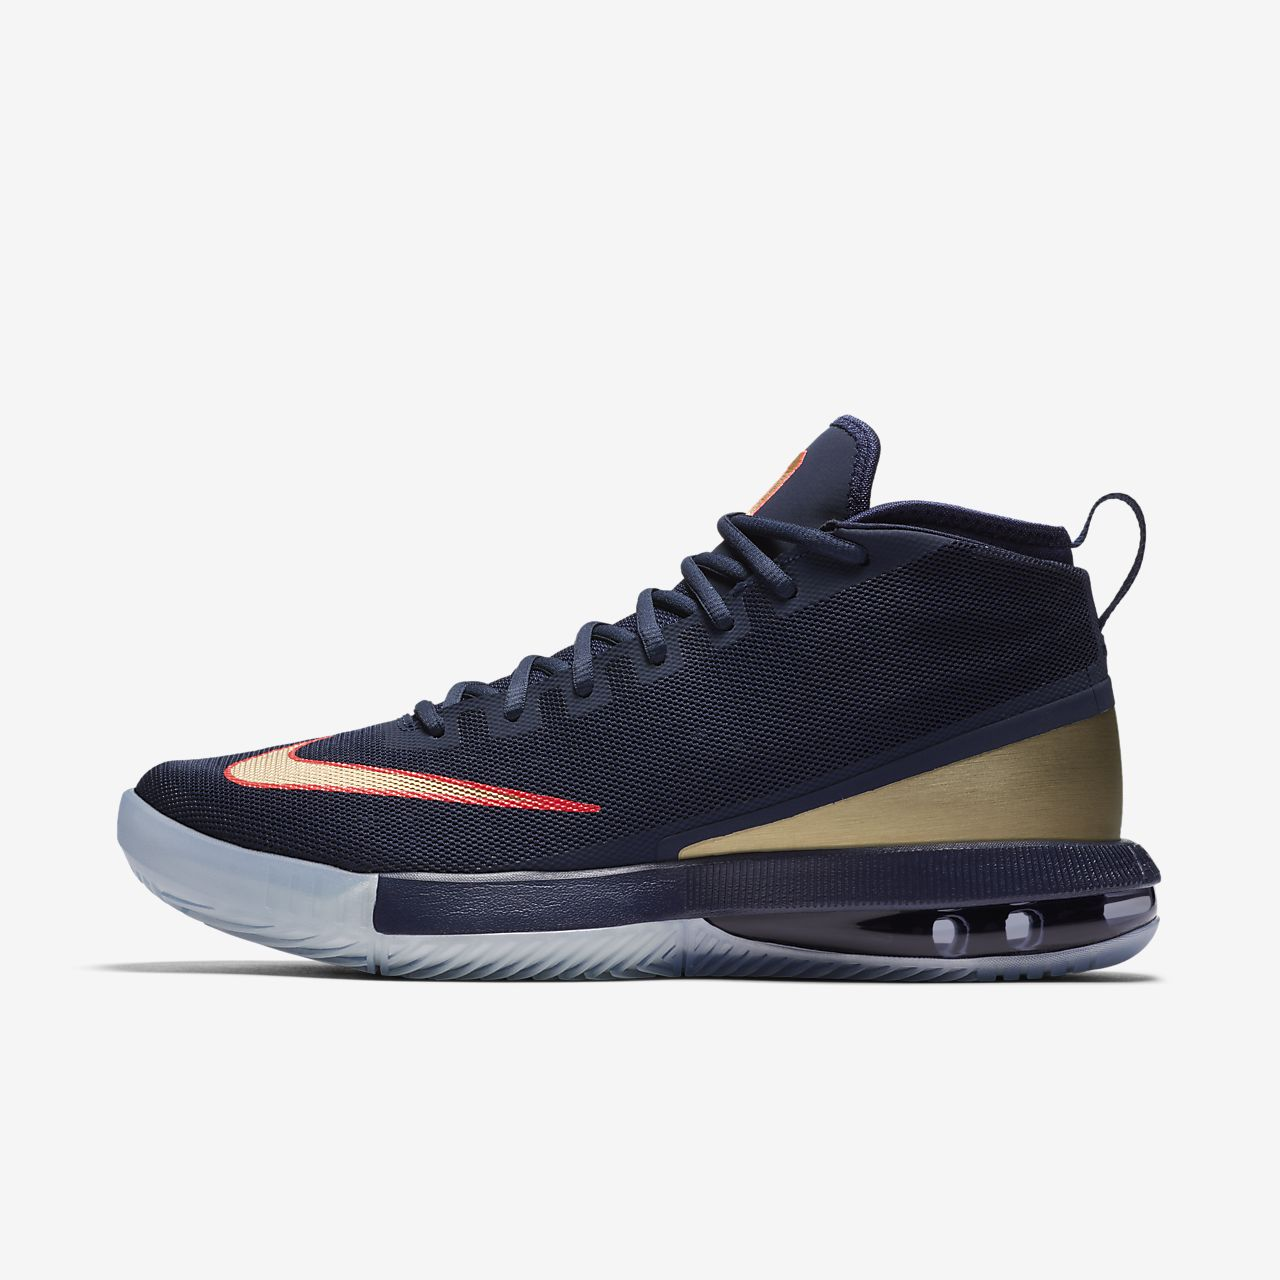 nike air max tn nike low basketball shoes 2016